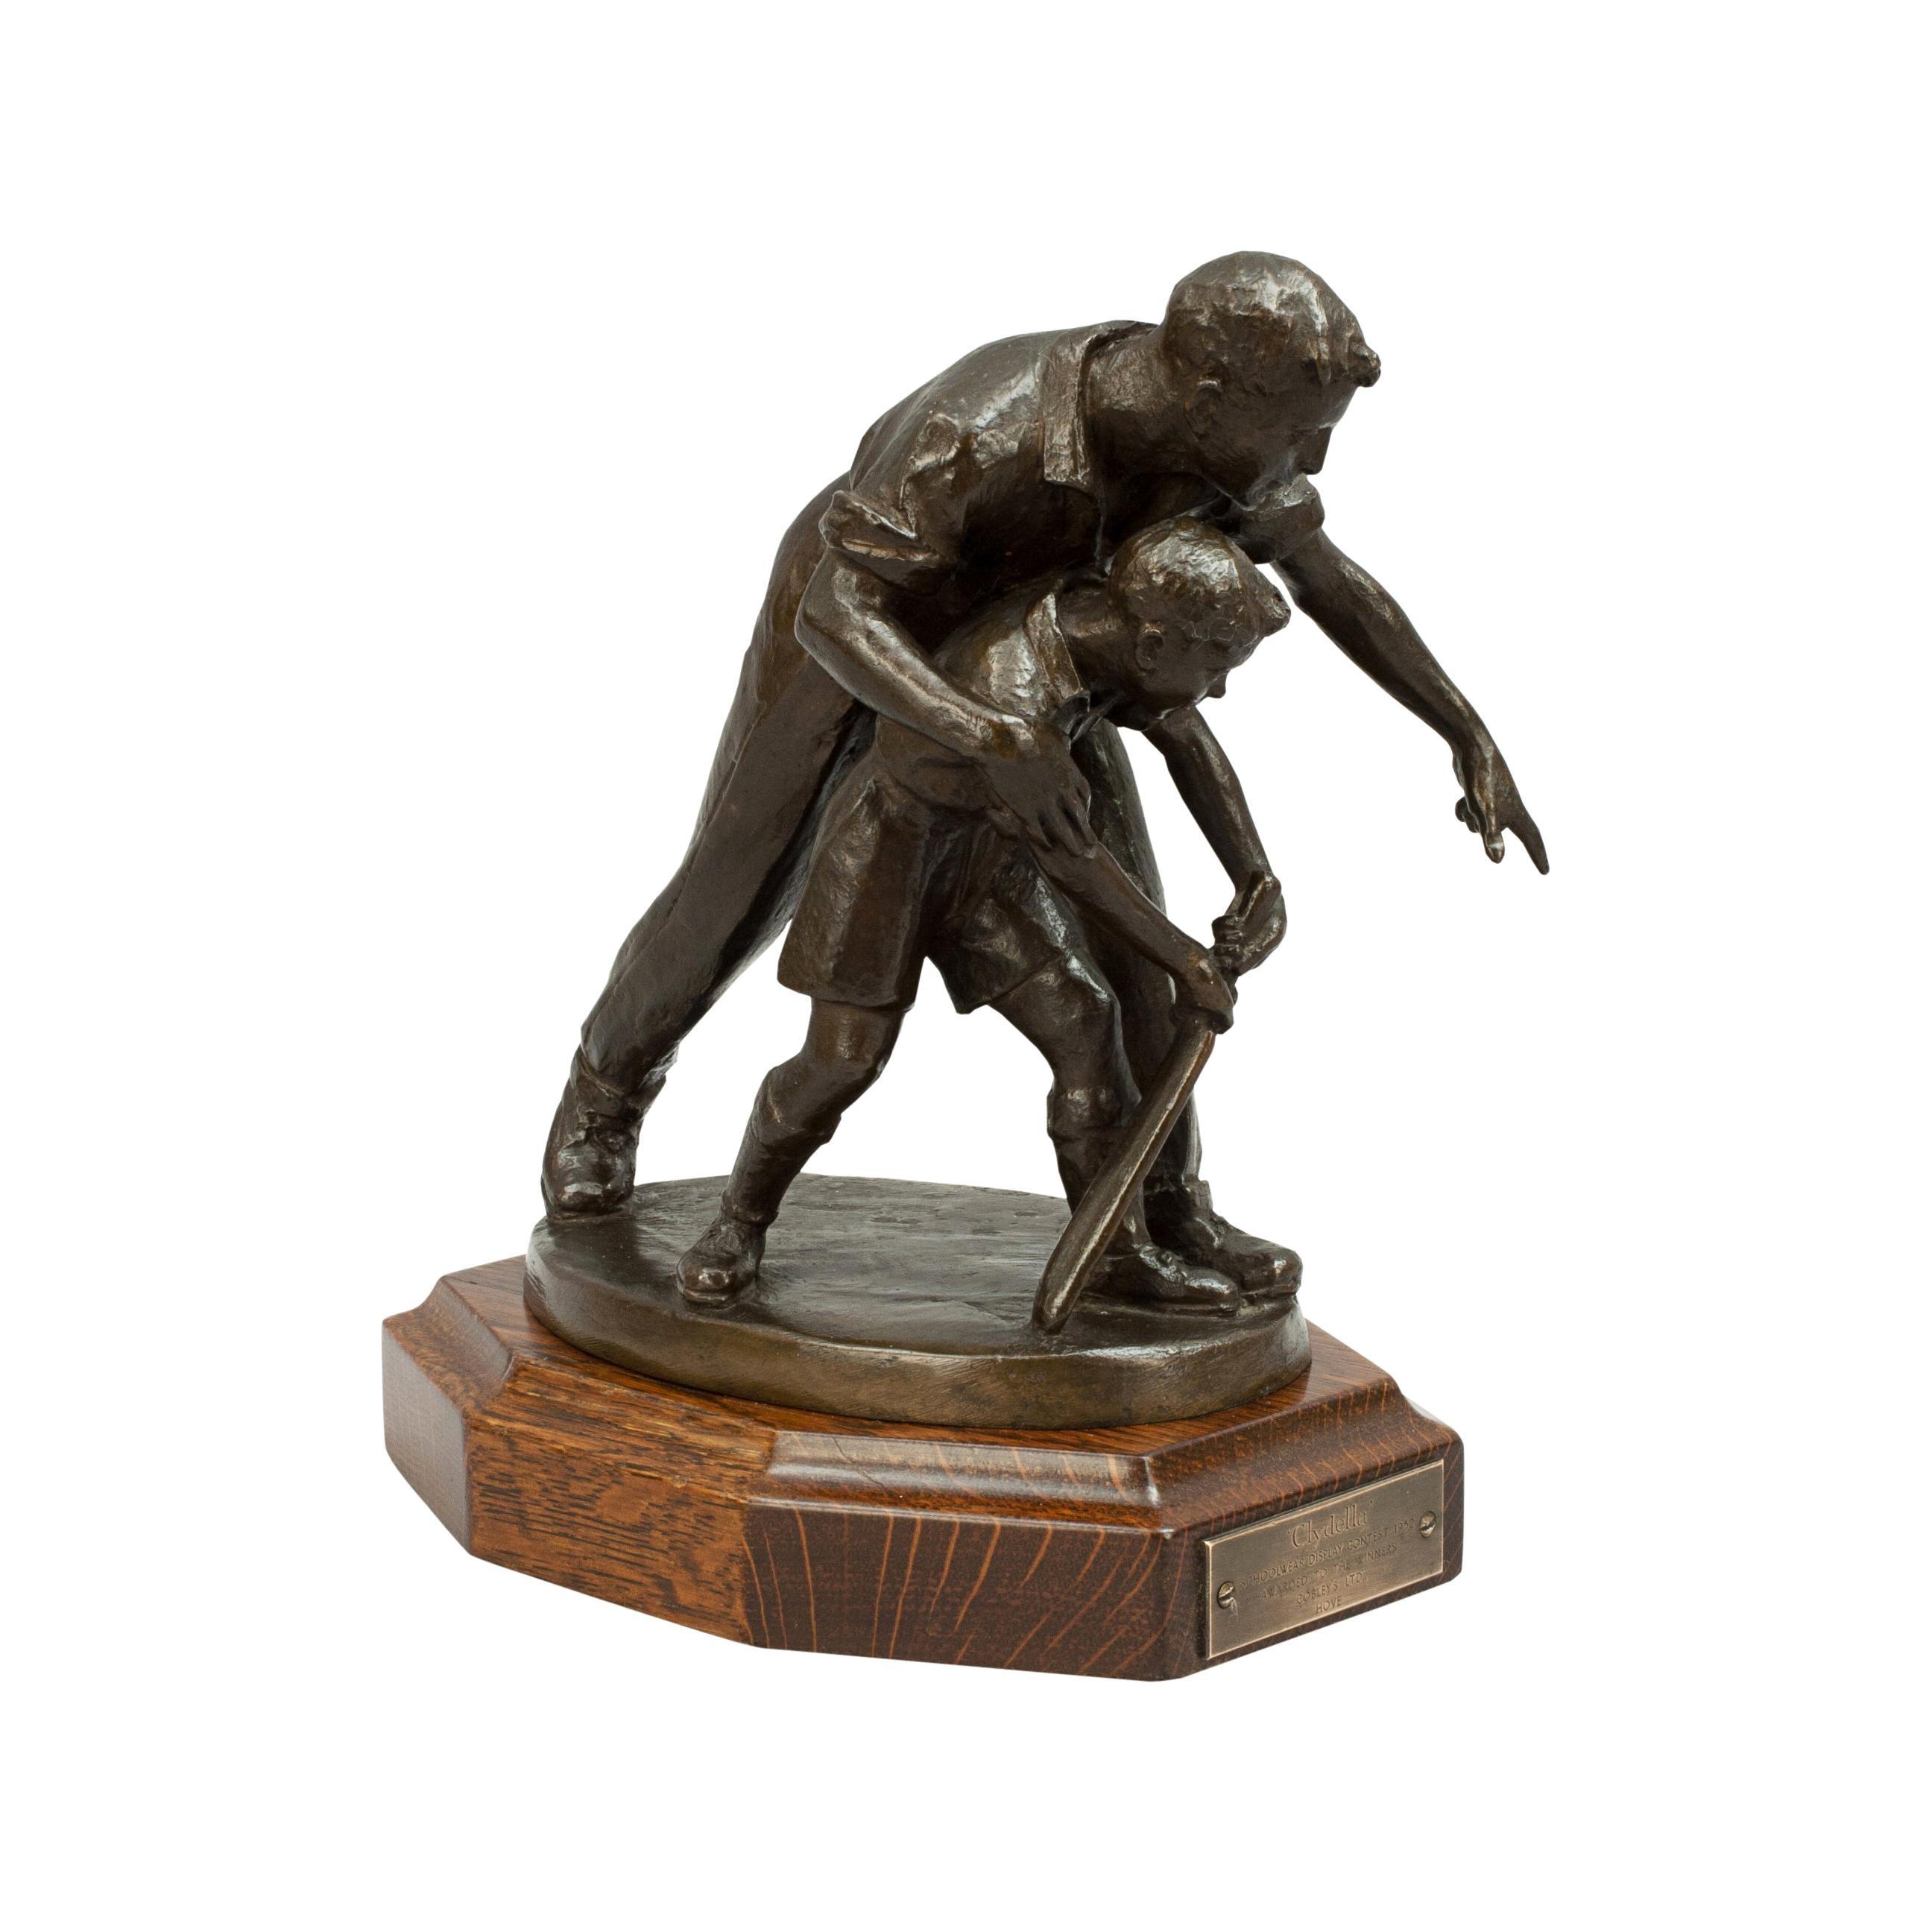 Antique Bronze Cricket Figures, Father & Son Cricket Statue